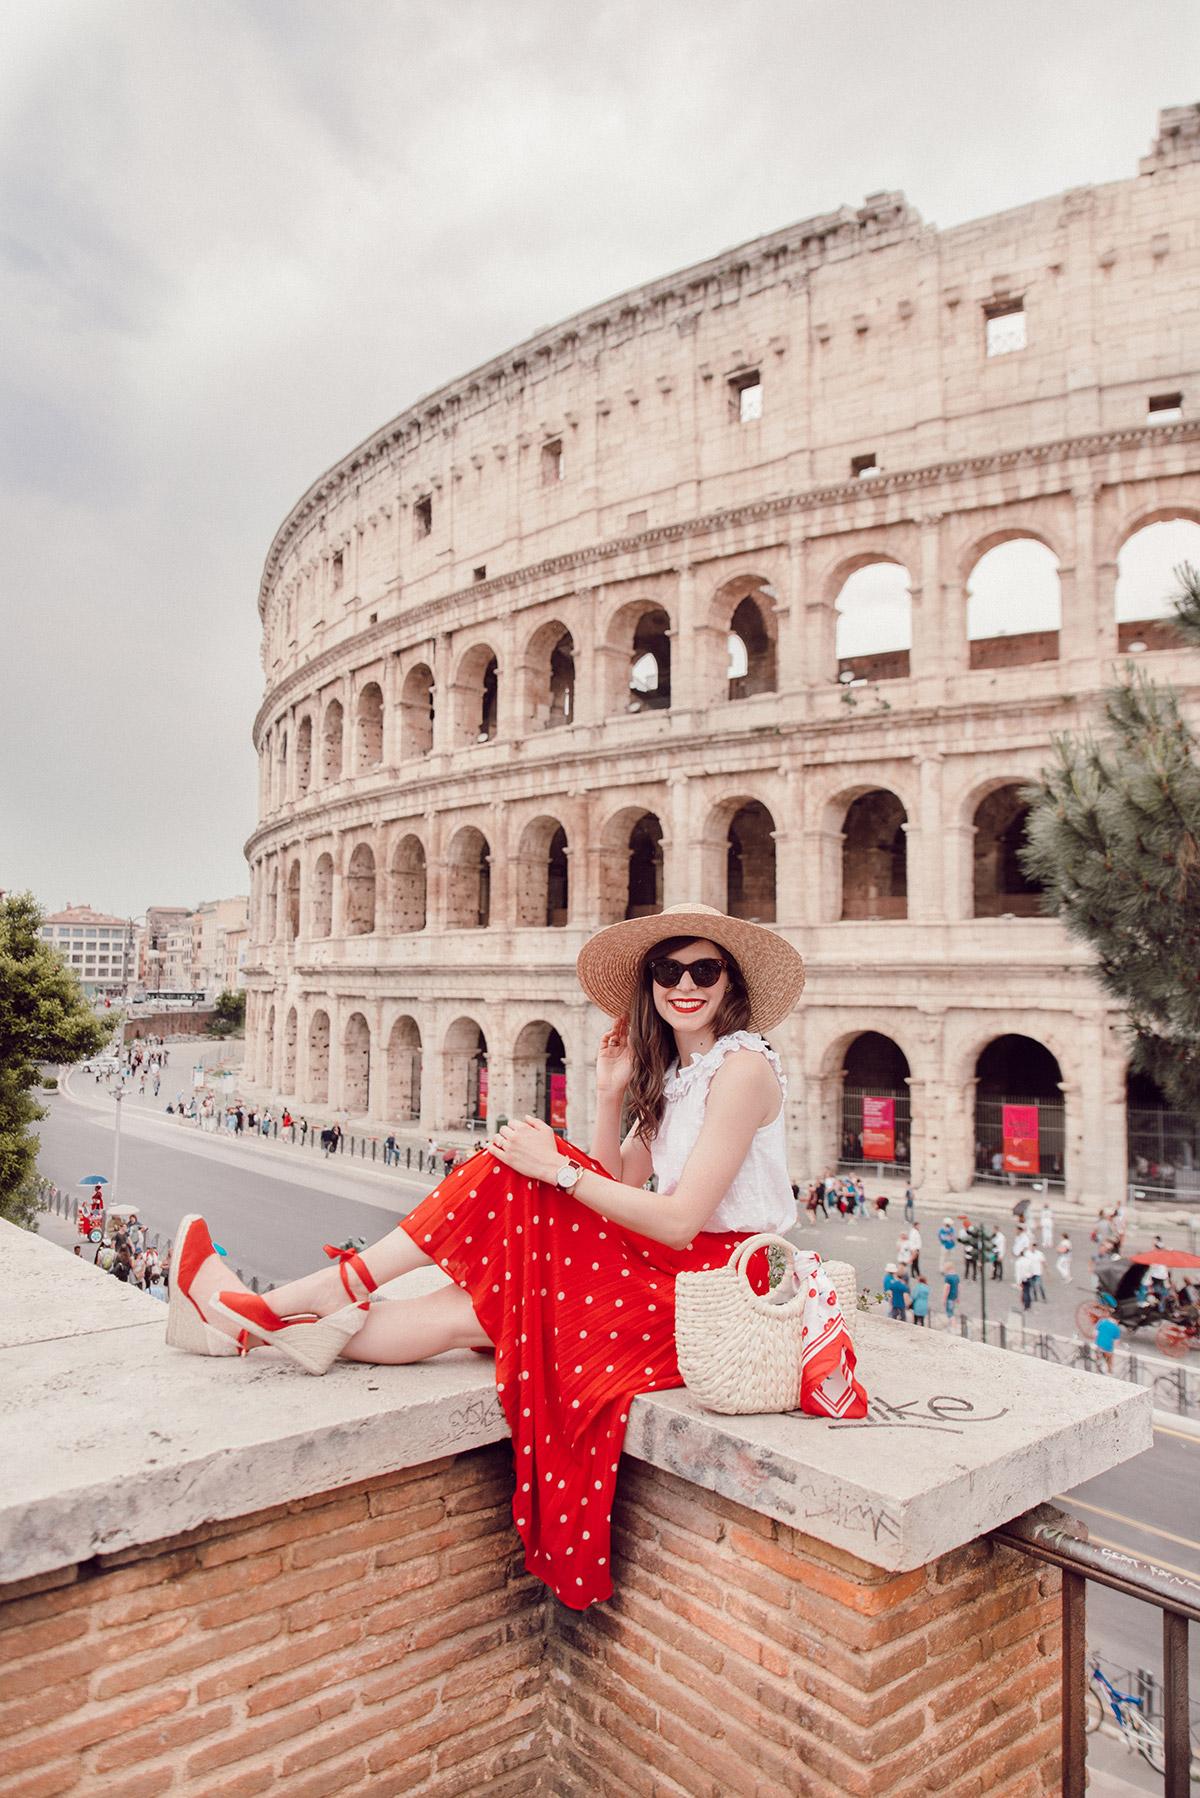 Rome-Colisee-2